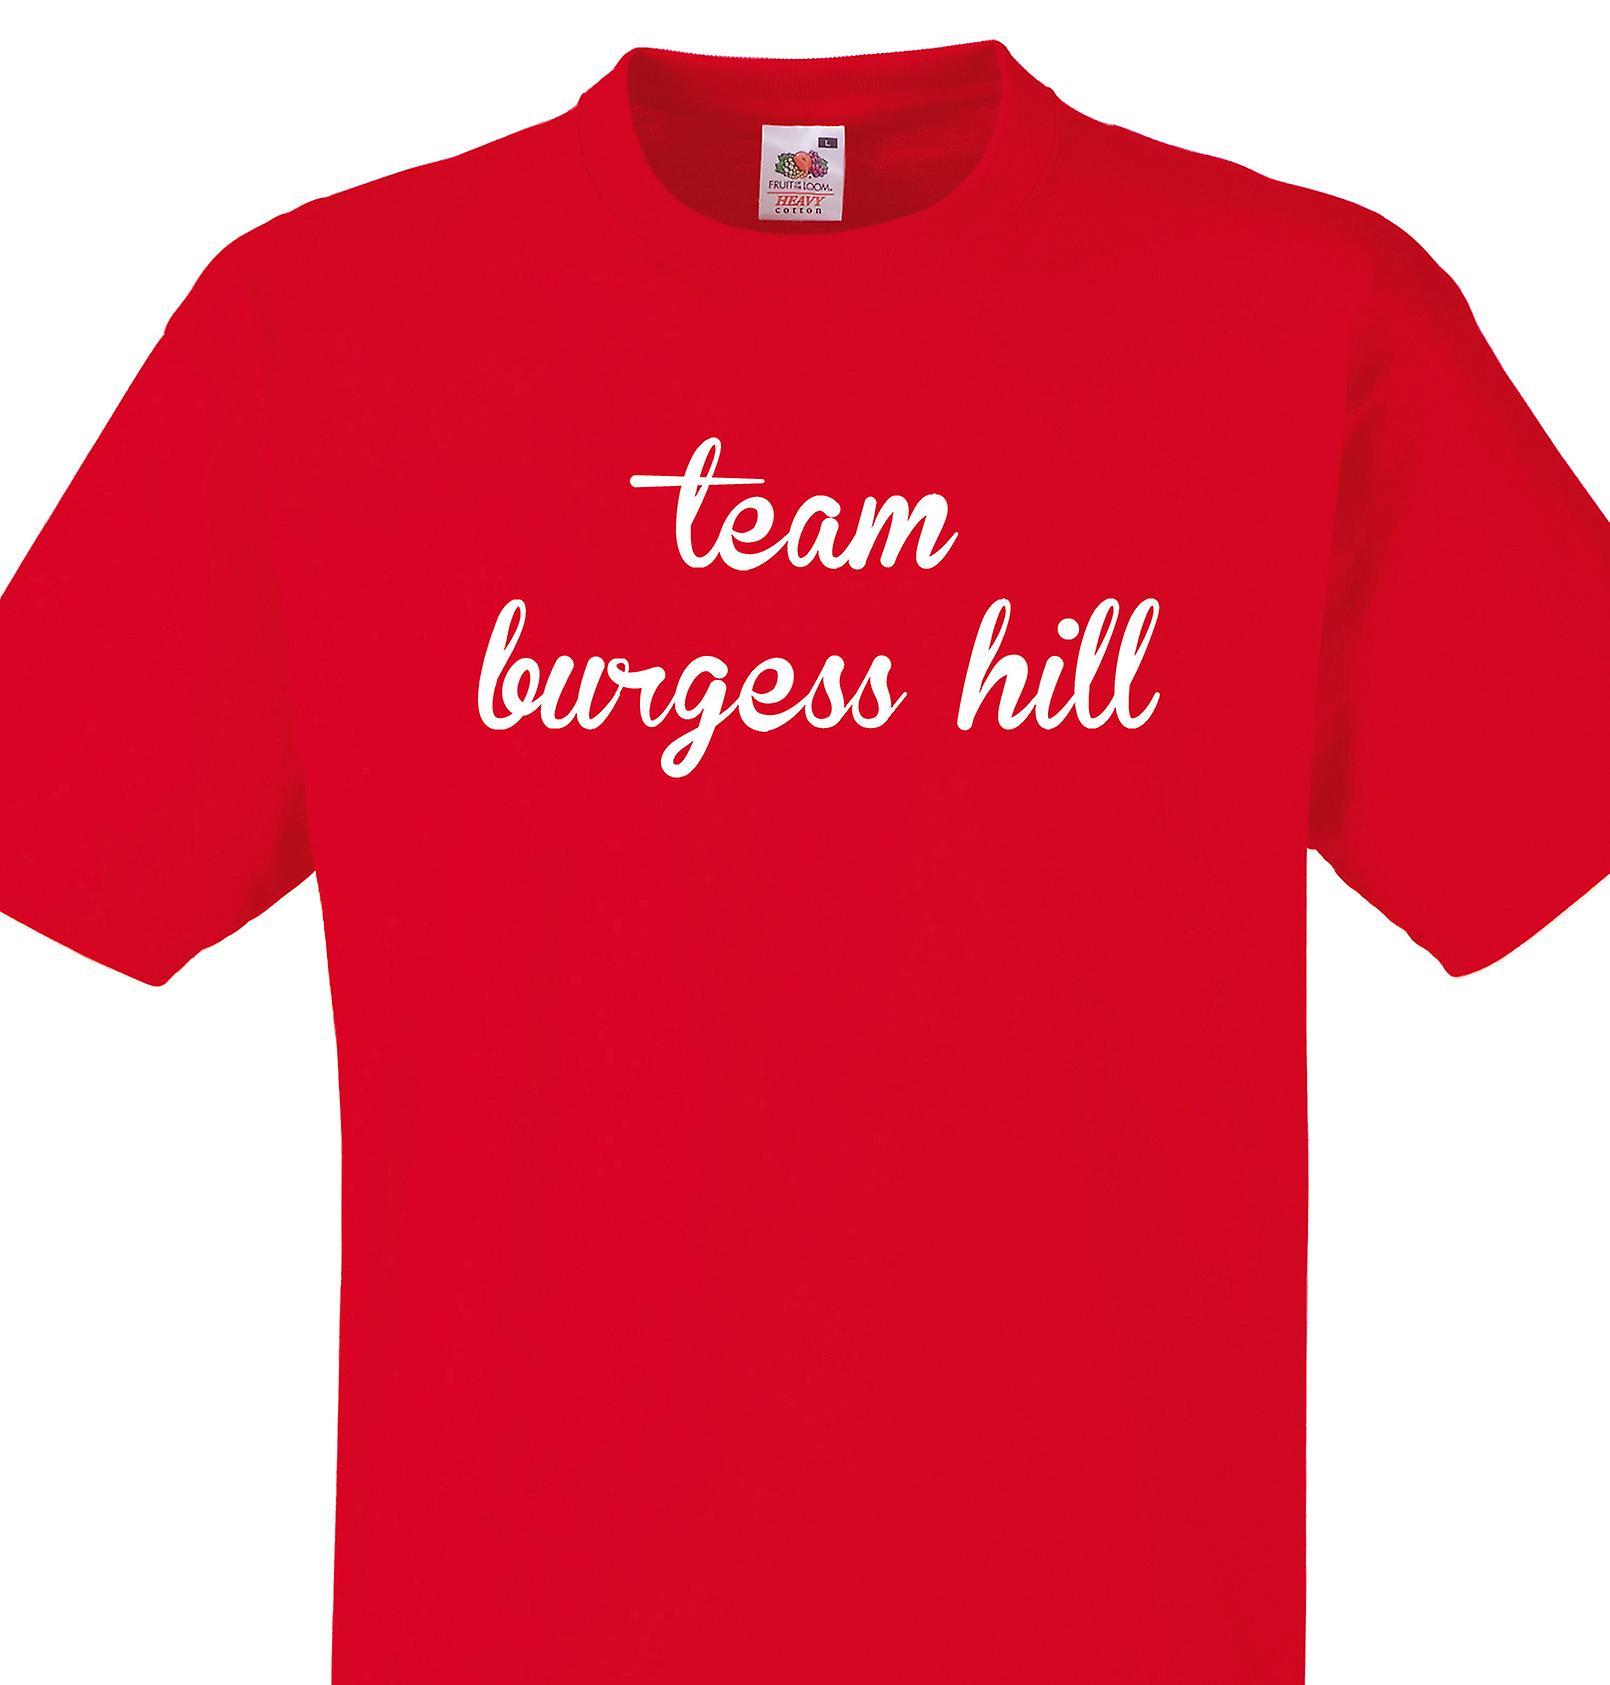 Team Burgess hill Red T shirt